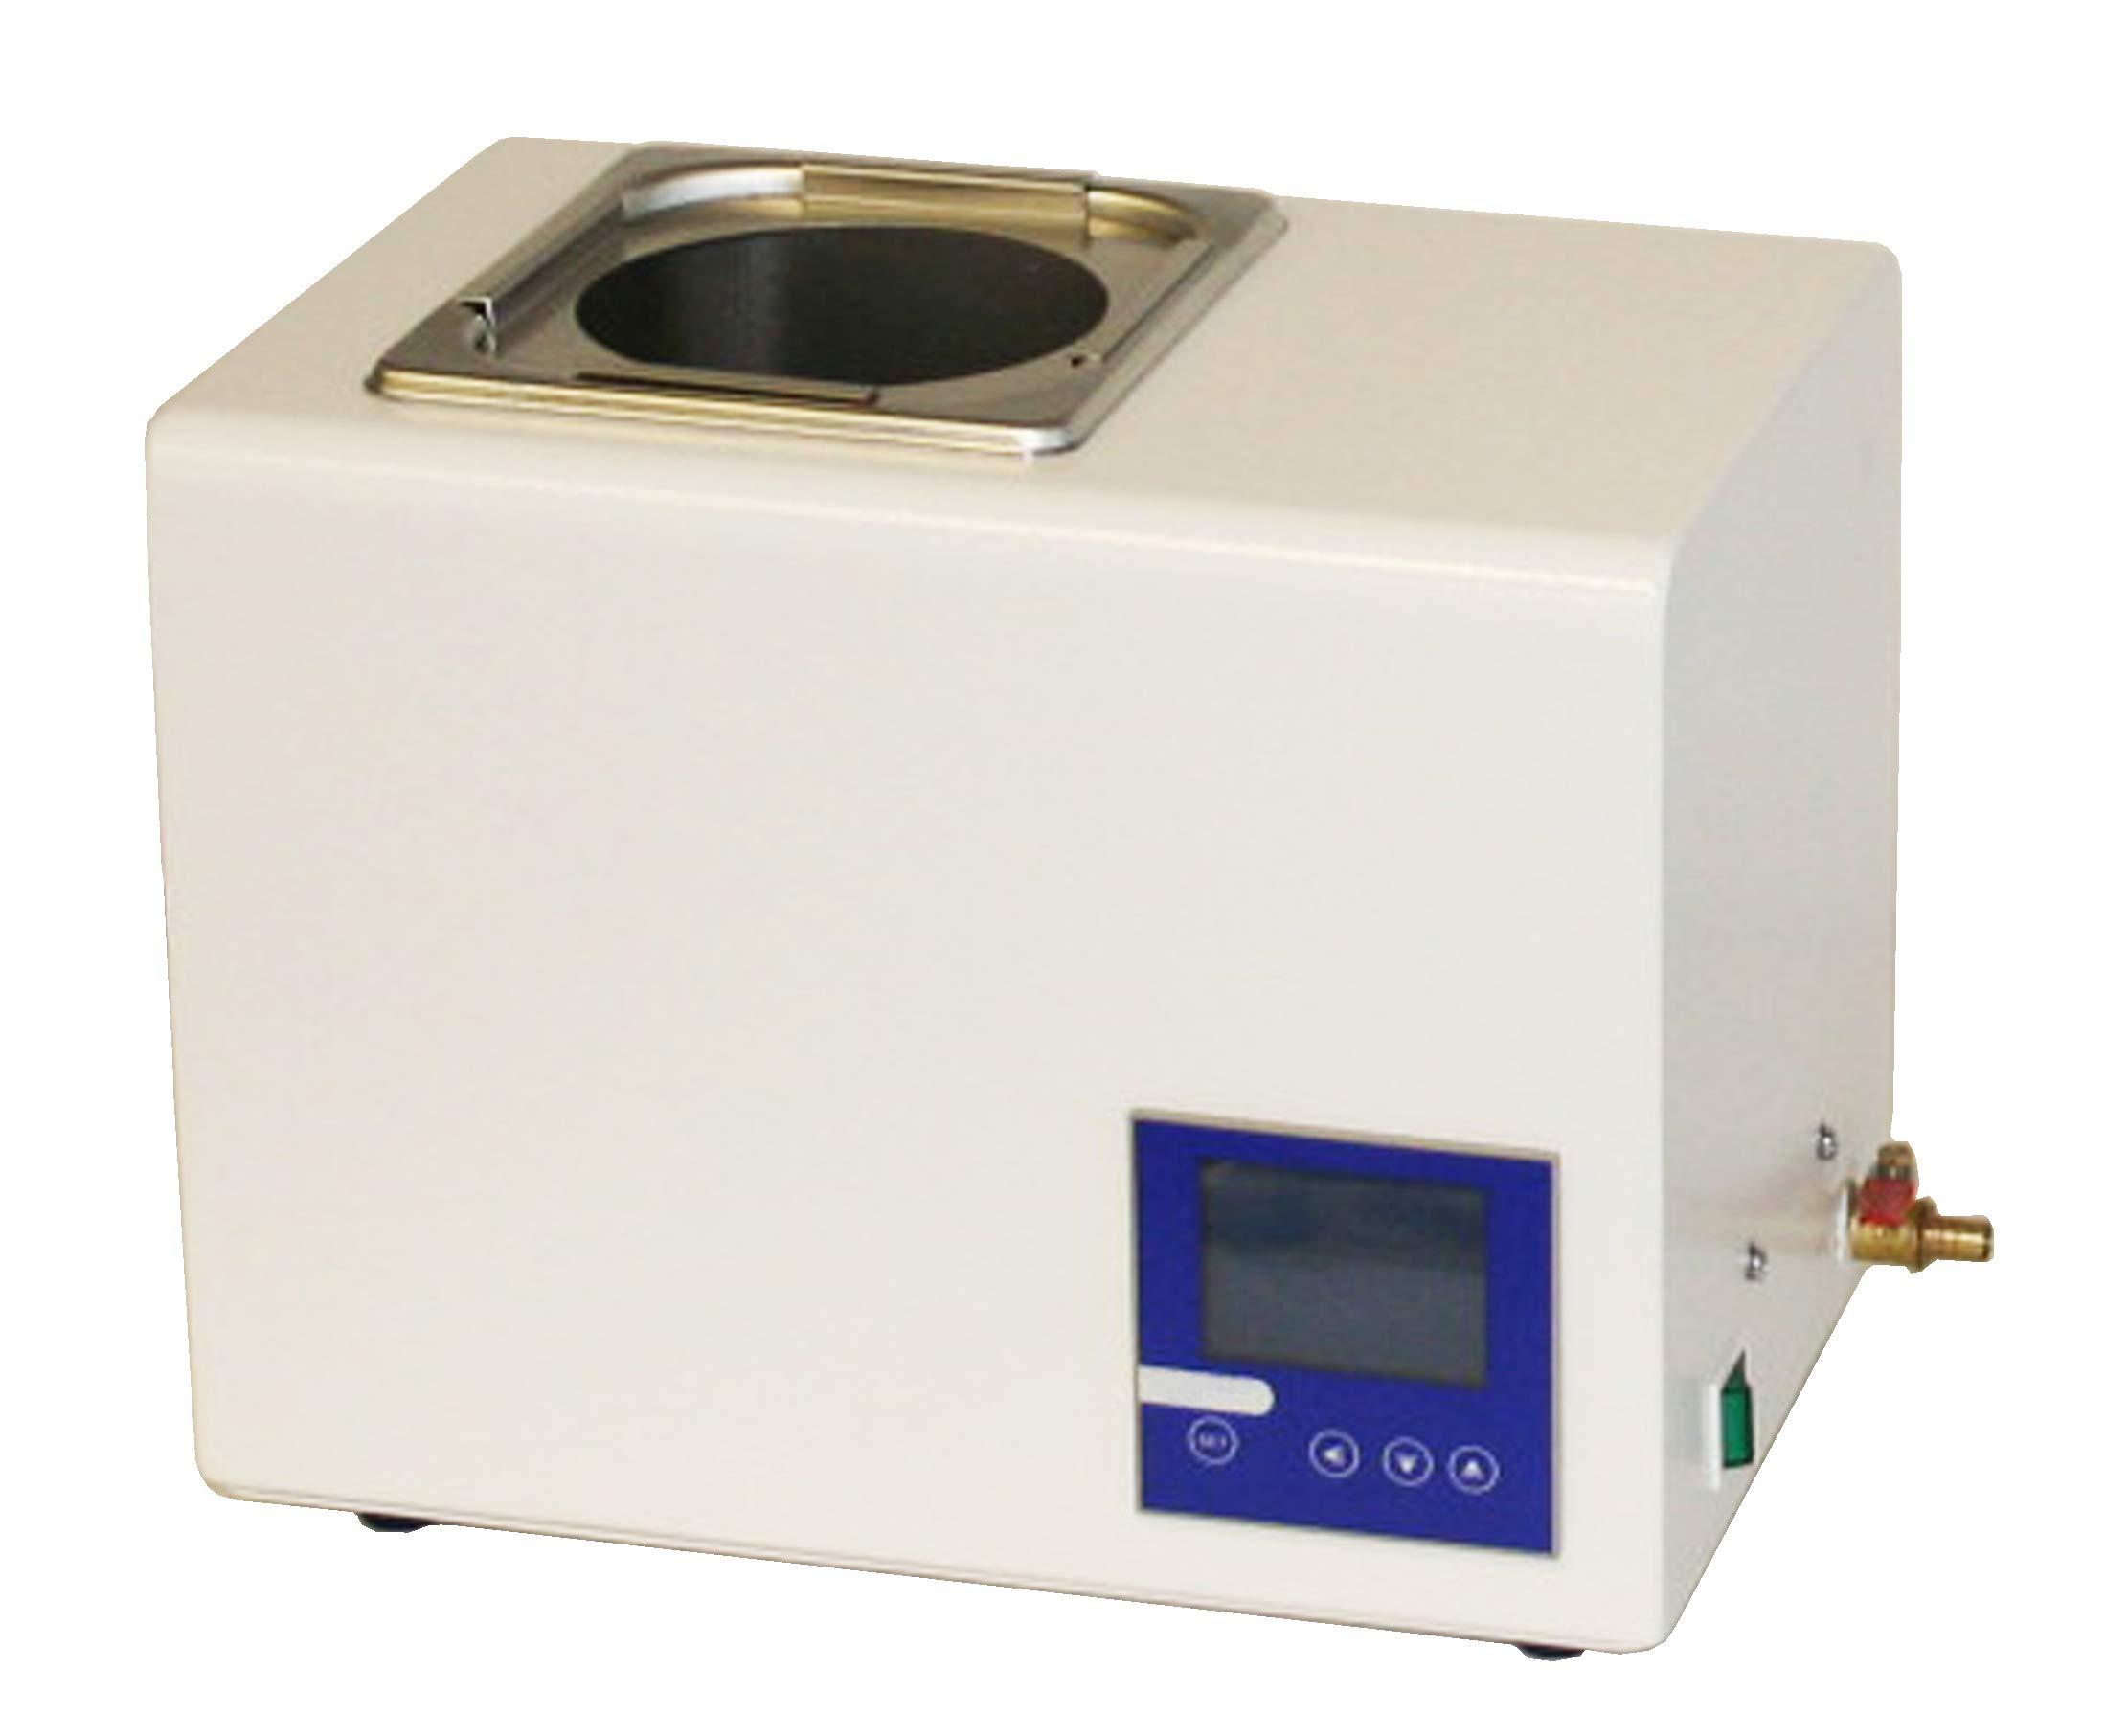 Jackson Global JS-HW-2L Digital Water Bath   Capacity:2 Liter   Temperature Range: 5-99 ºC   Voltage: 110V / 50-60Hz   Temperature Fluctuation: ±0.2 ºC